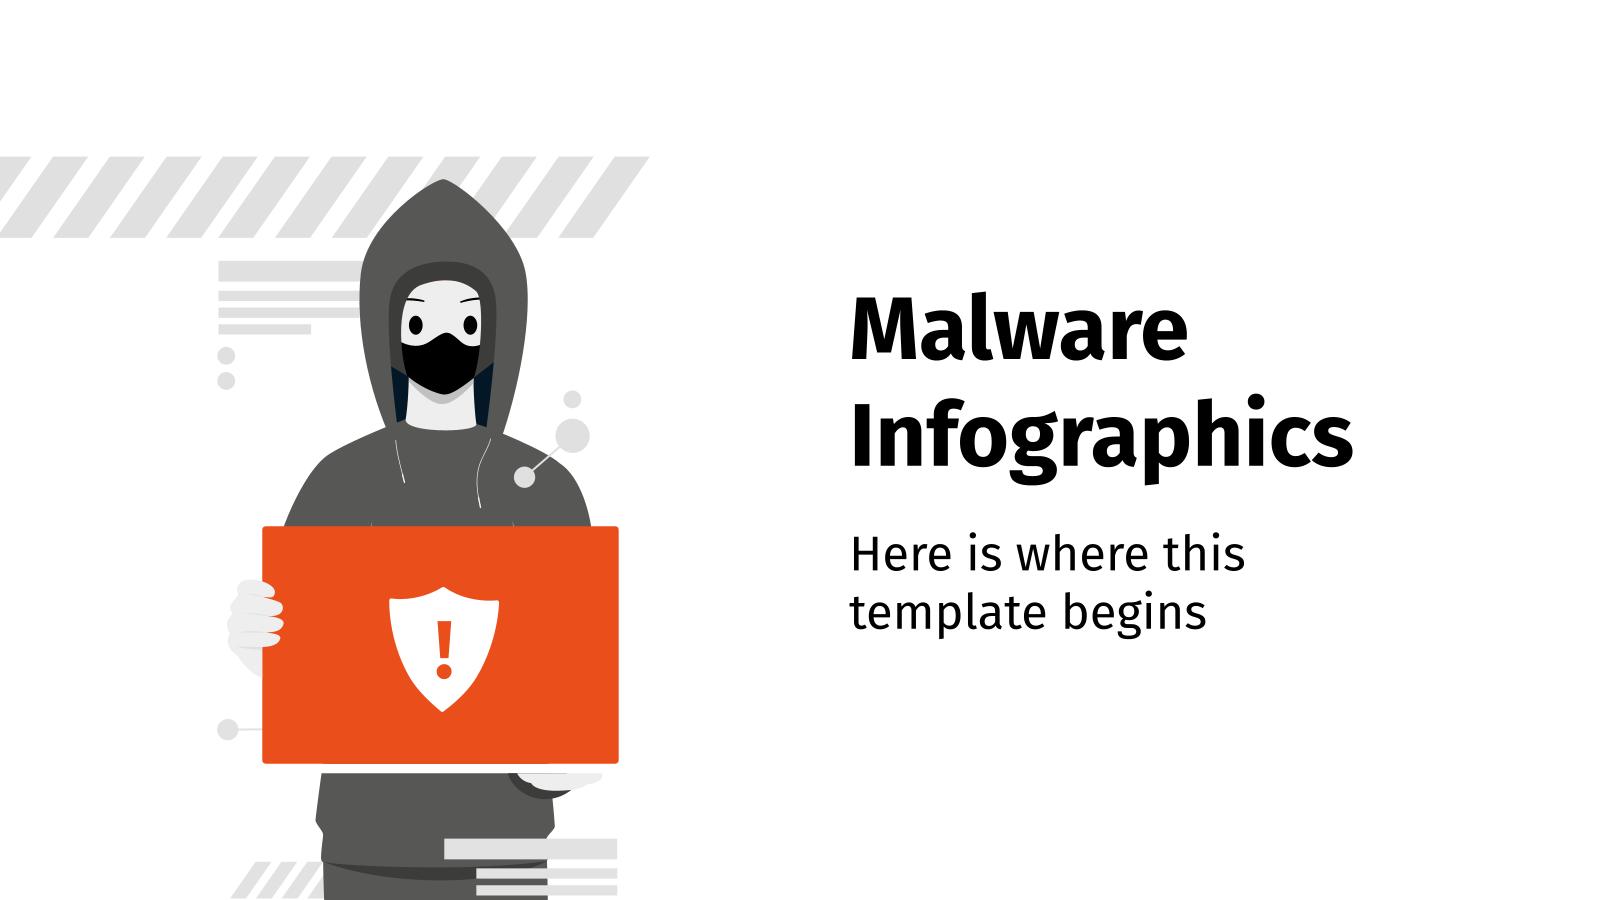 Malware Infographics presentation template